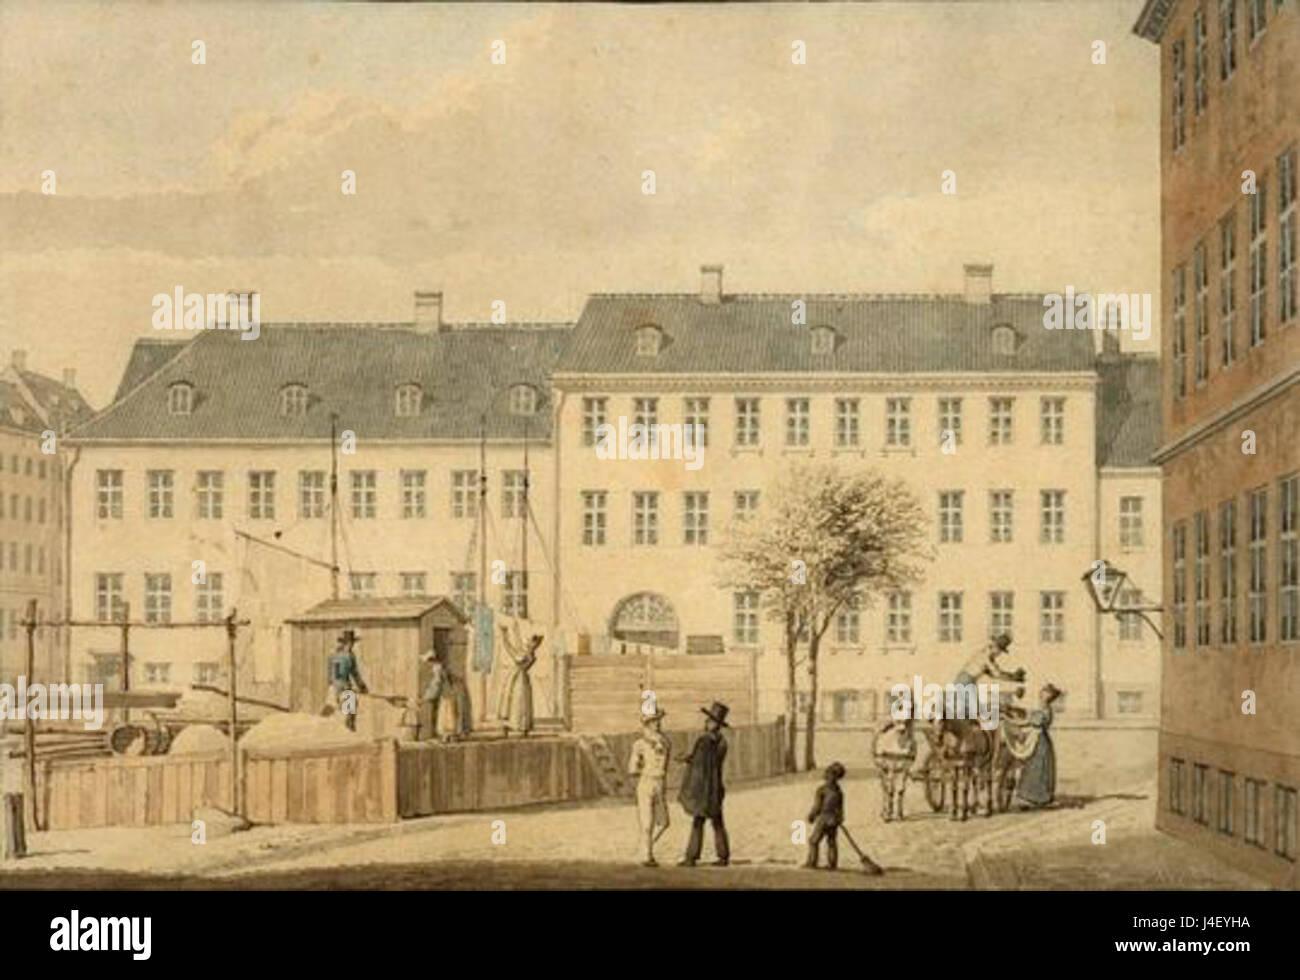 H. G. F. Holm   Frederiksholms Kanal  1835 - Stock Image